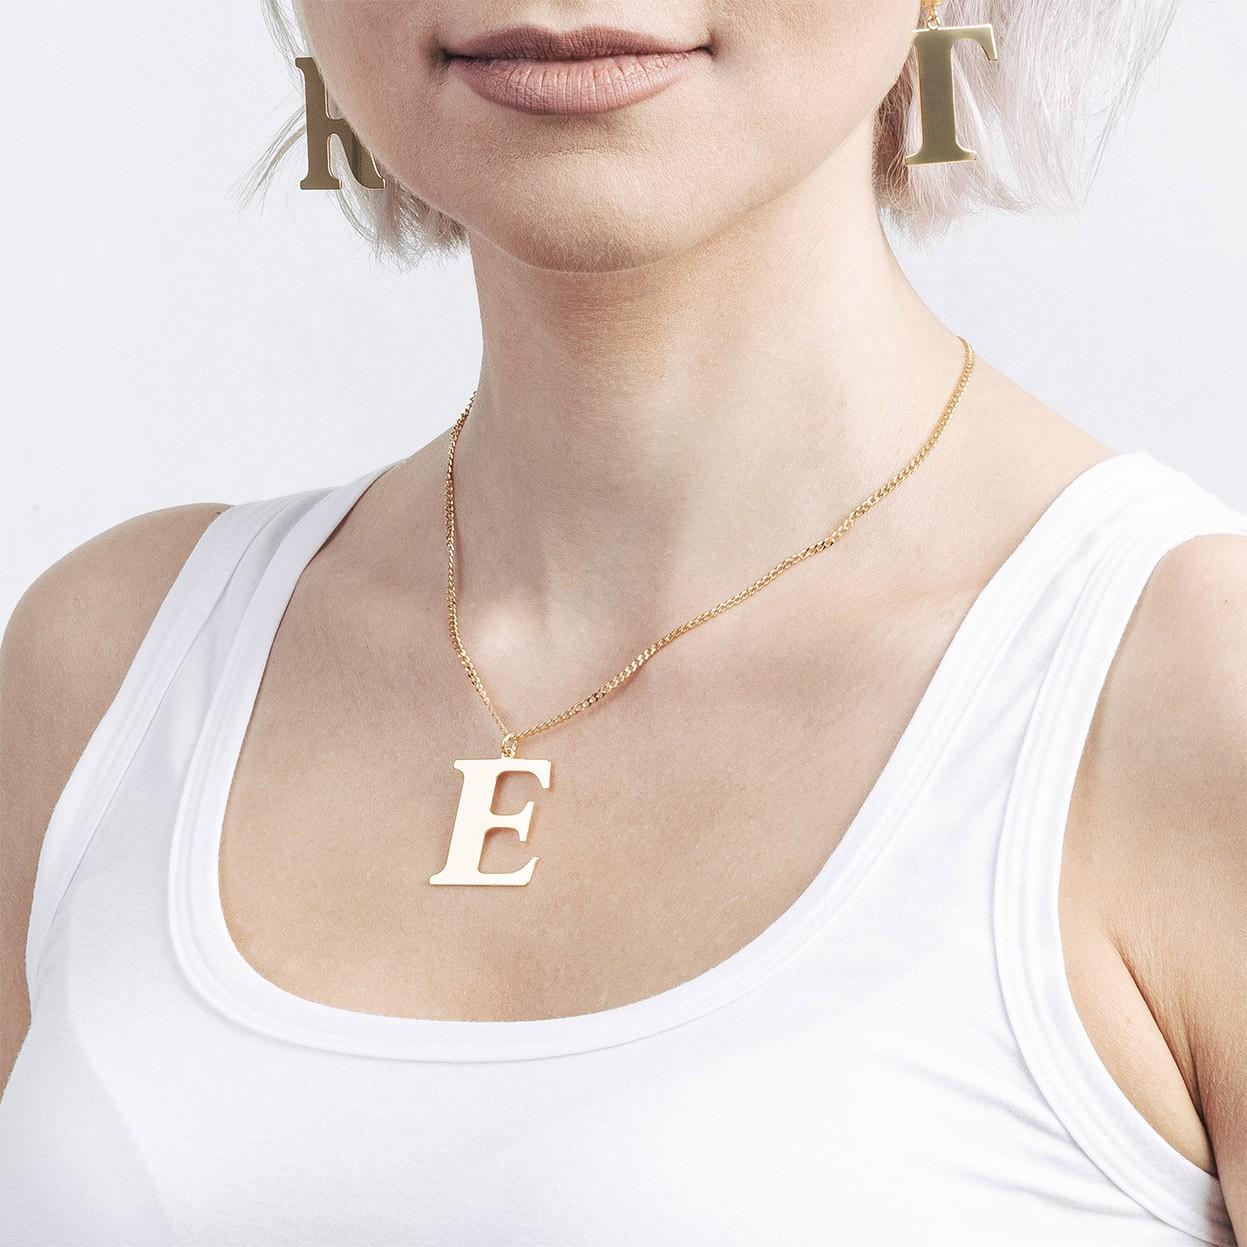 Srebrny naszyjnik dowolna litera 3 cm, alfabet, srebro 925